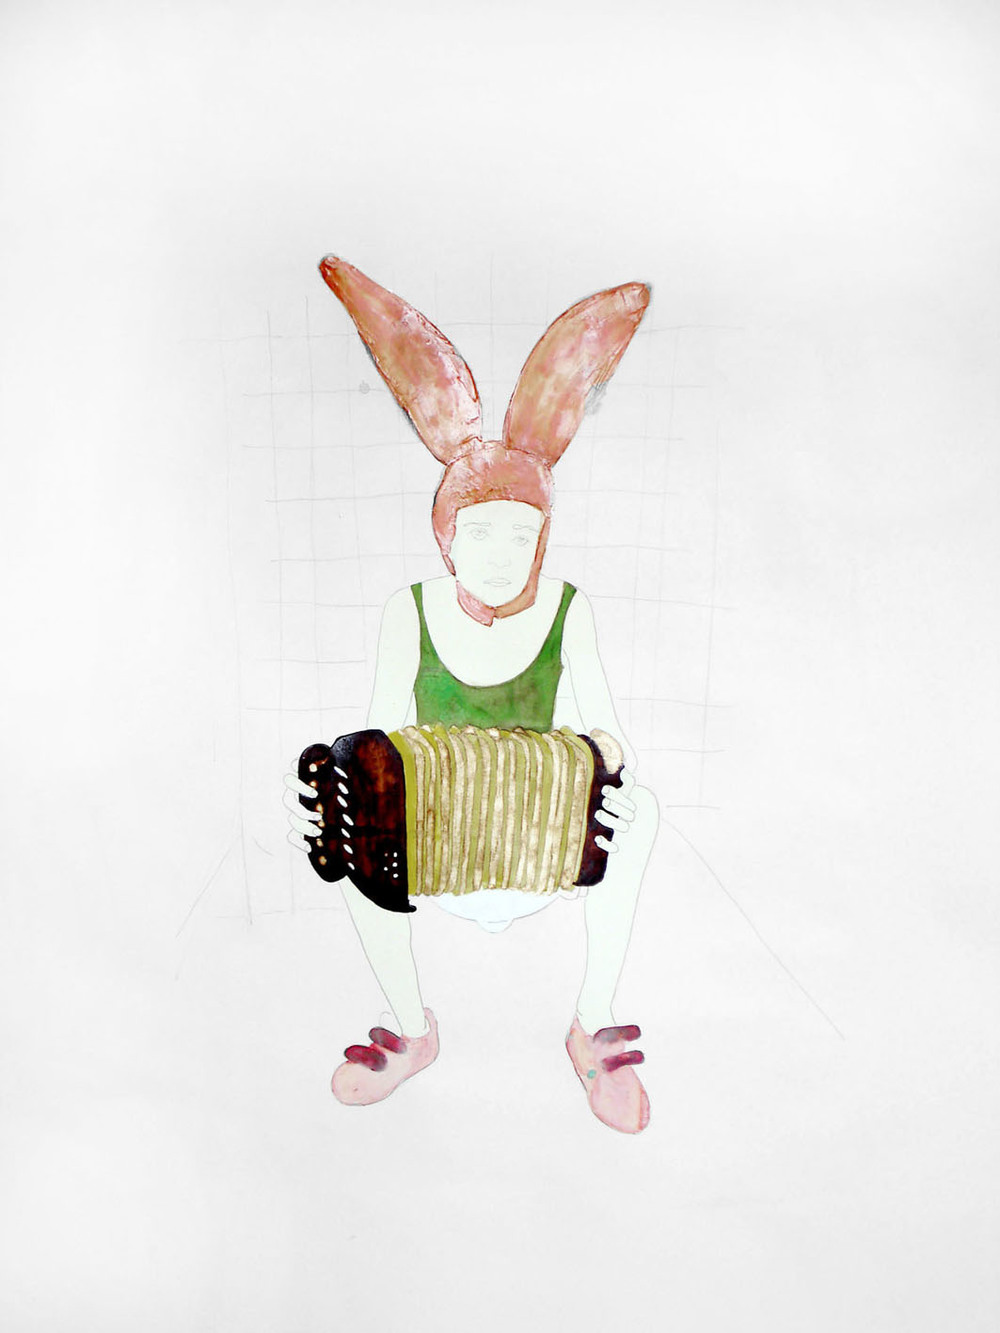 Conejo / Rabbit